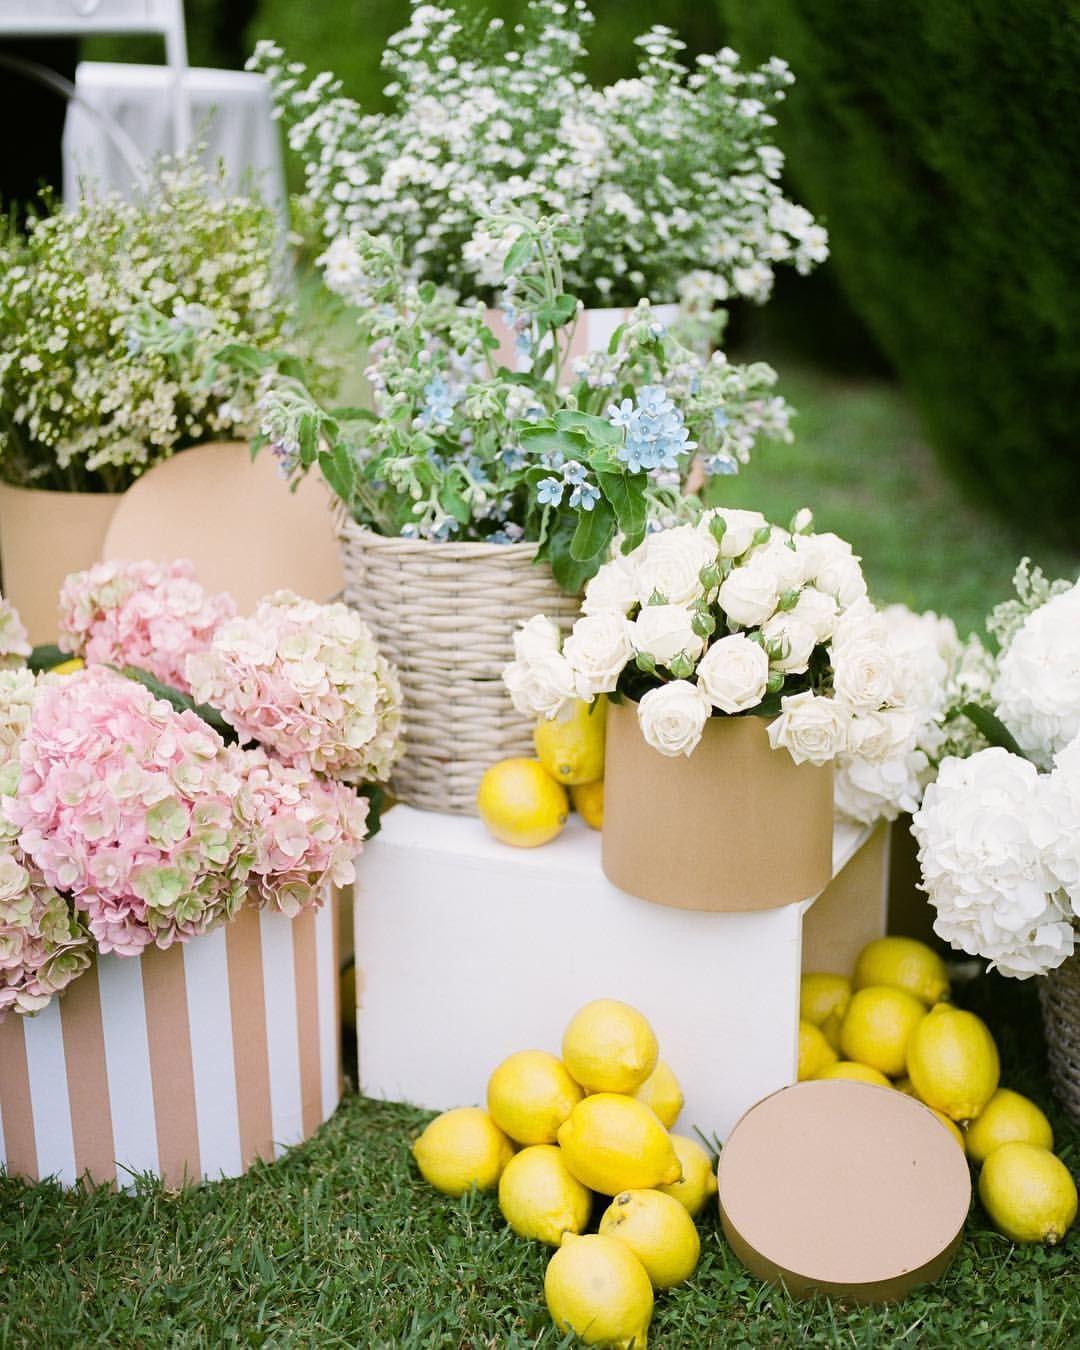 Soft Romantic Elegant Wedding Ideas: Romantic Soft Nuances , Elegant Striped Hat Boxes, Local